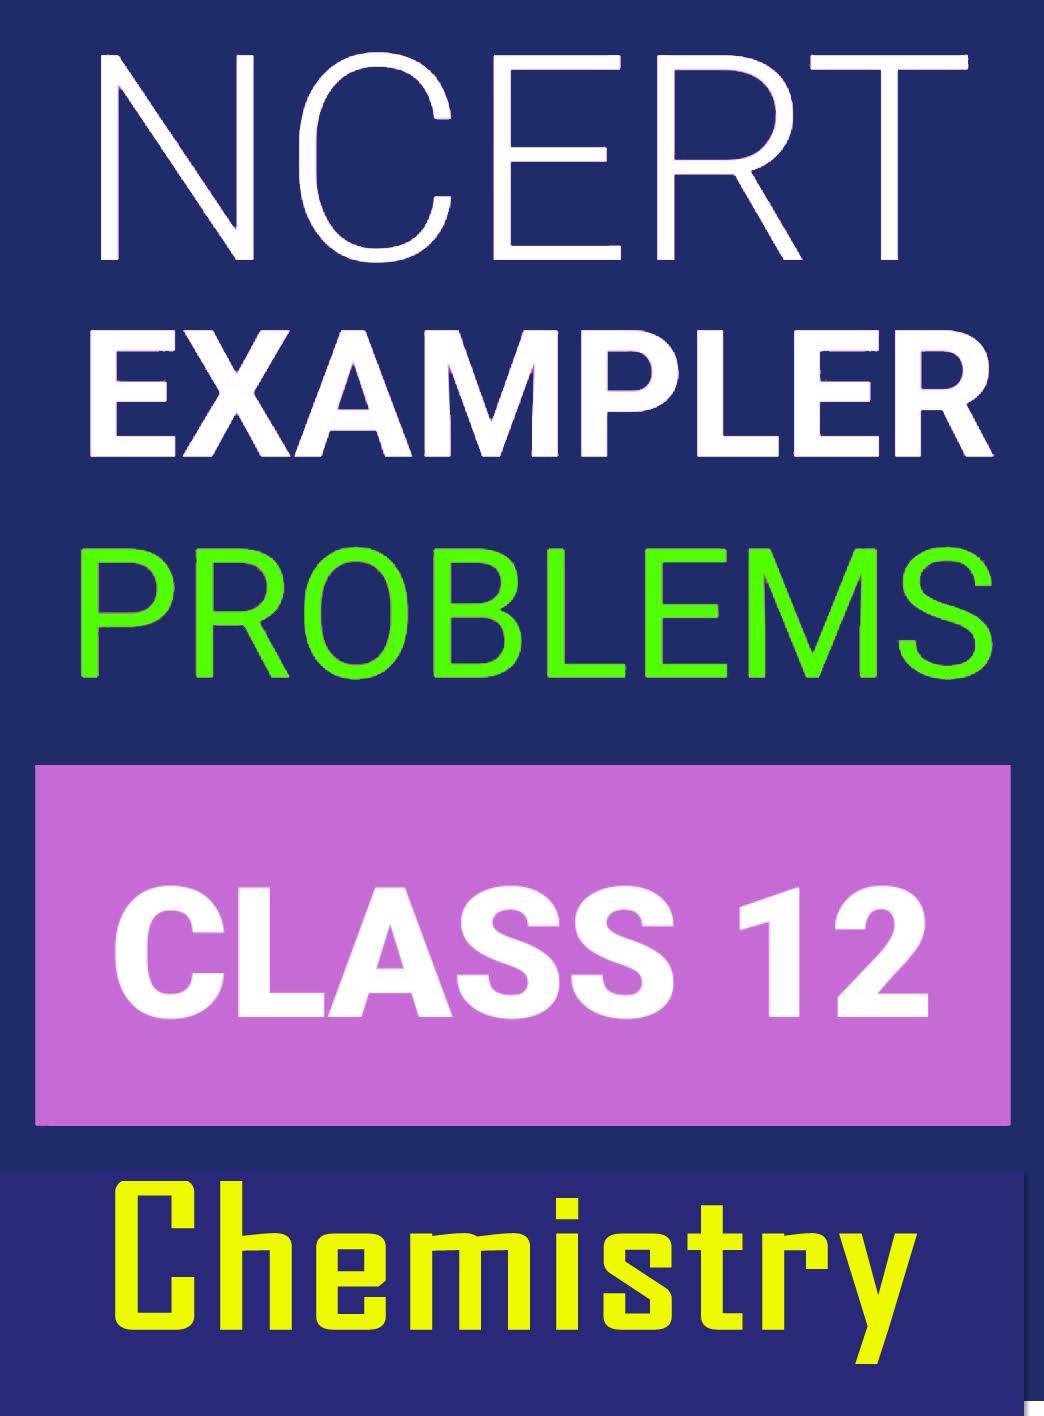 NCERT Mathematics Class-XII Exemplar Material For JEE